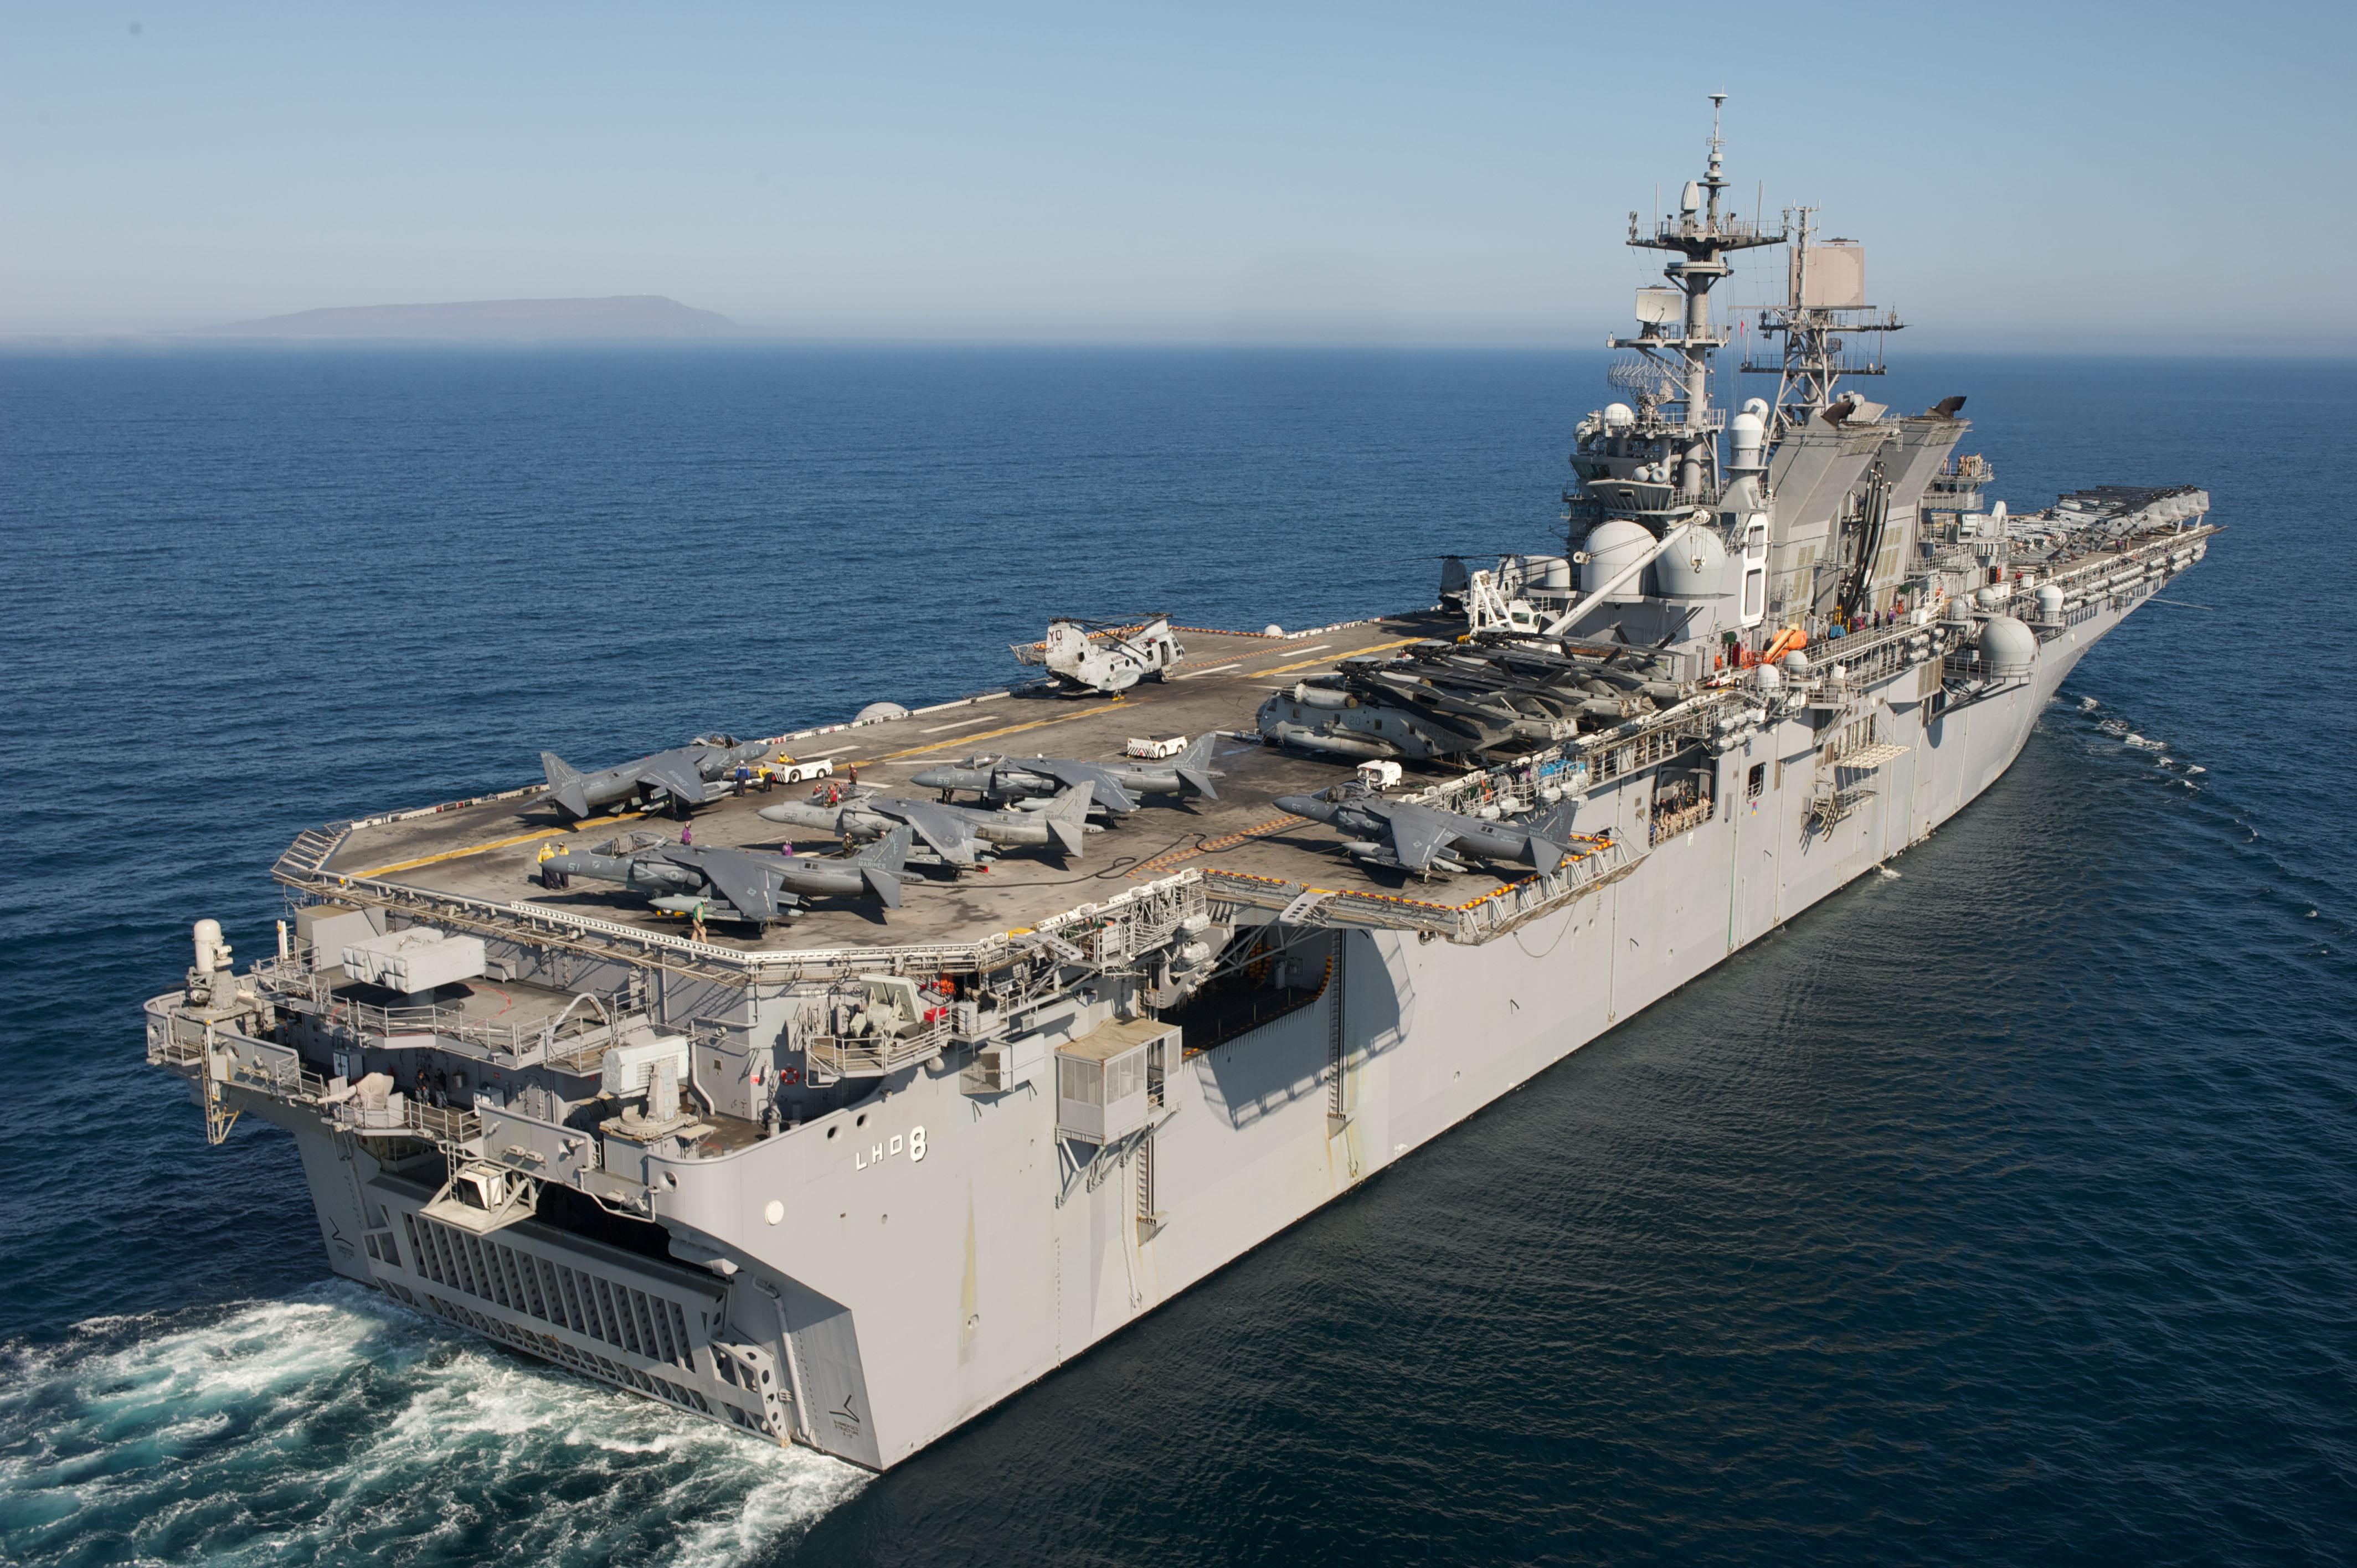 US_Navy_110907-N-KD852-132_The_amphibious_assault_ship_USS_Makin_Island_(LHD_8)_transits_off_the_coast_of_Southern_California_conducting_flight_ope.jpg